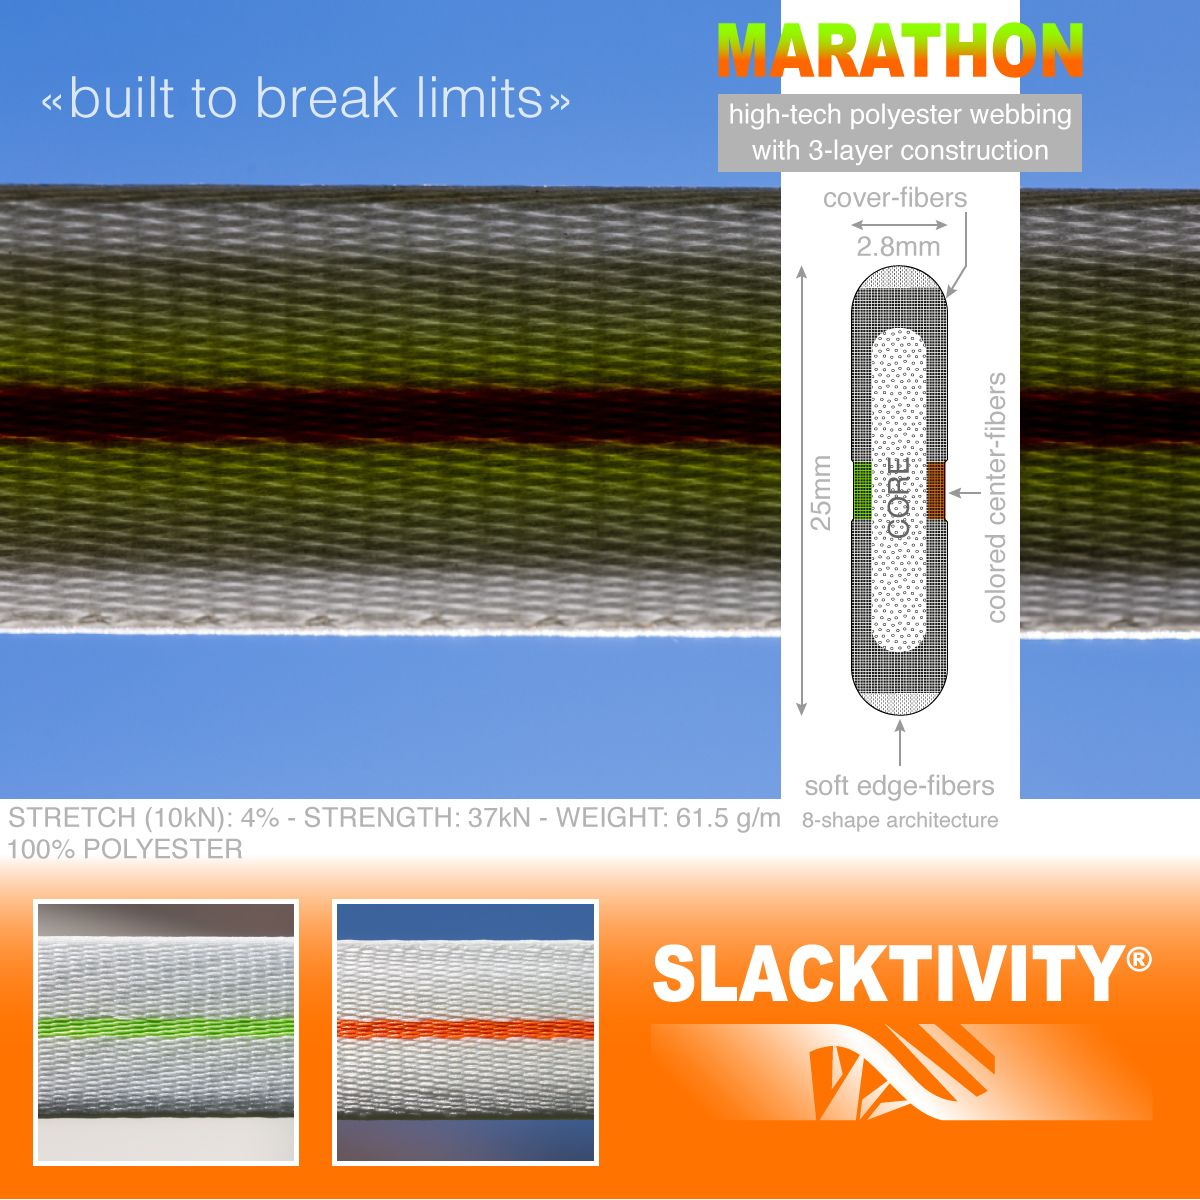 marathon webbing